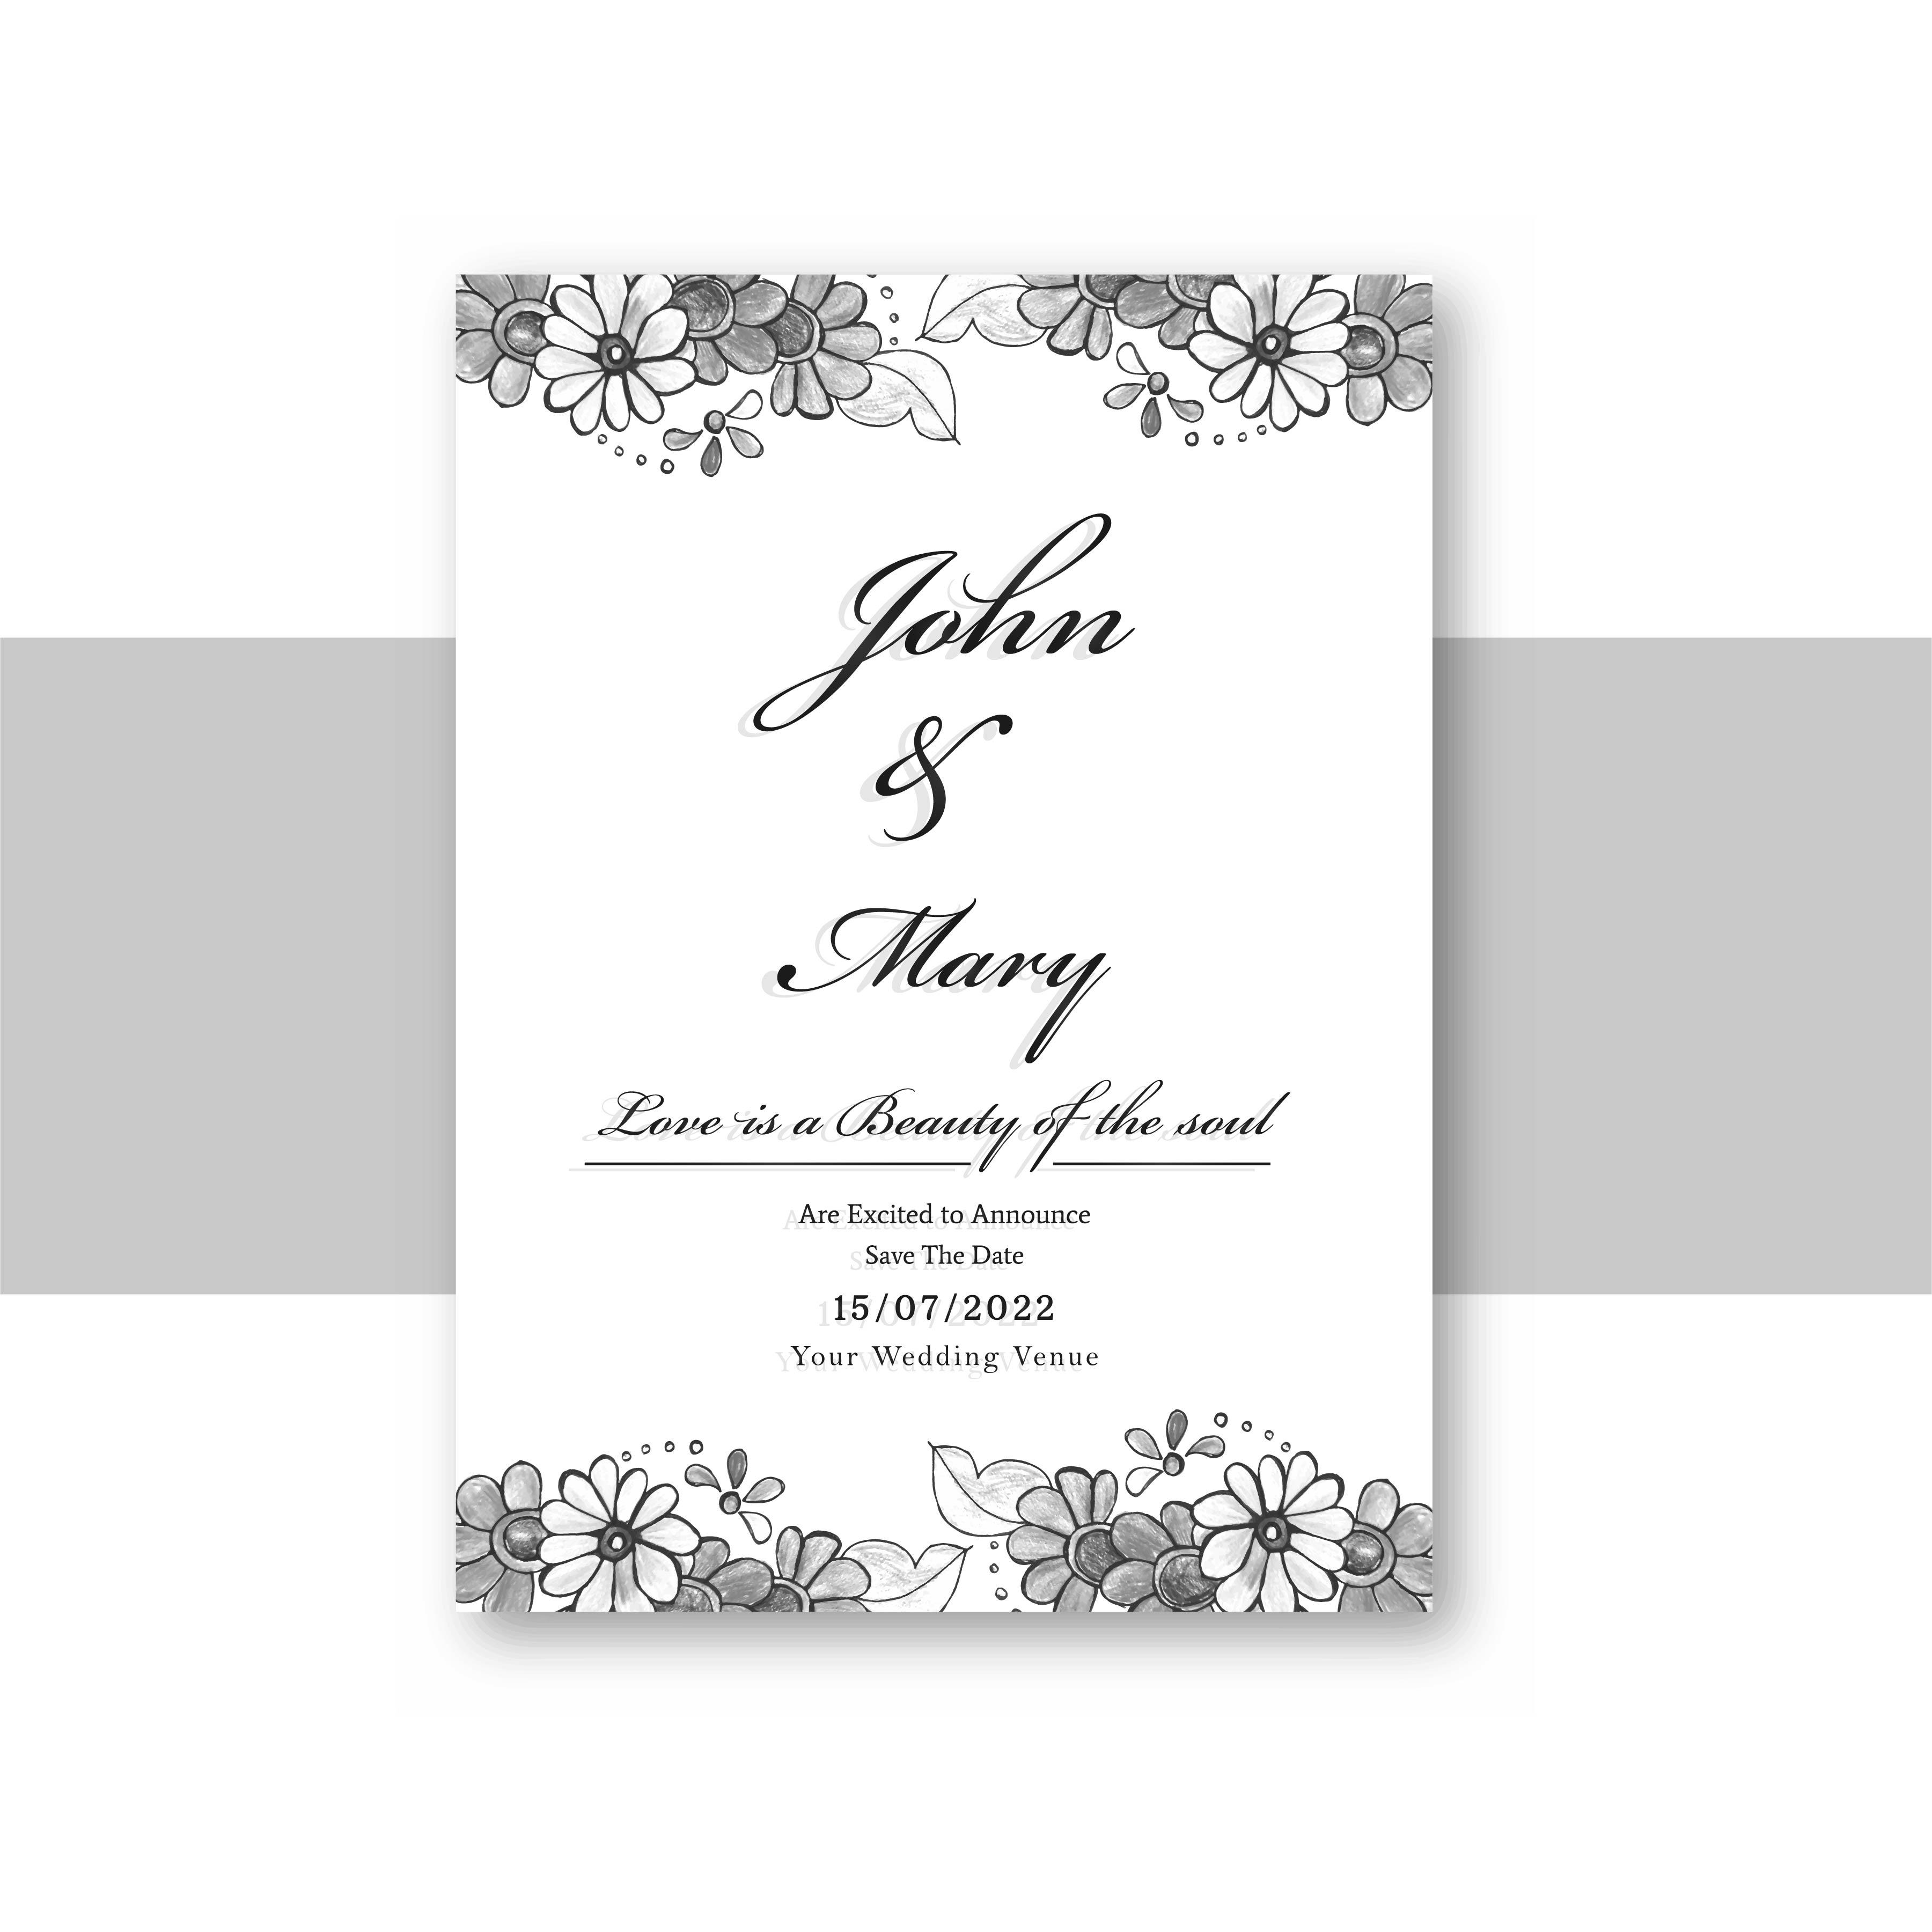 Beautiful wedding invitation card template with decorative flora